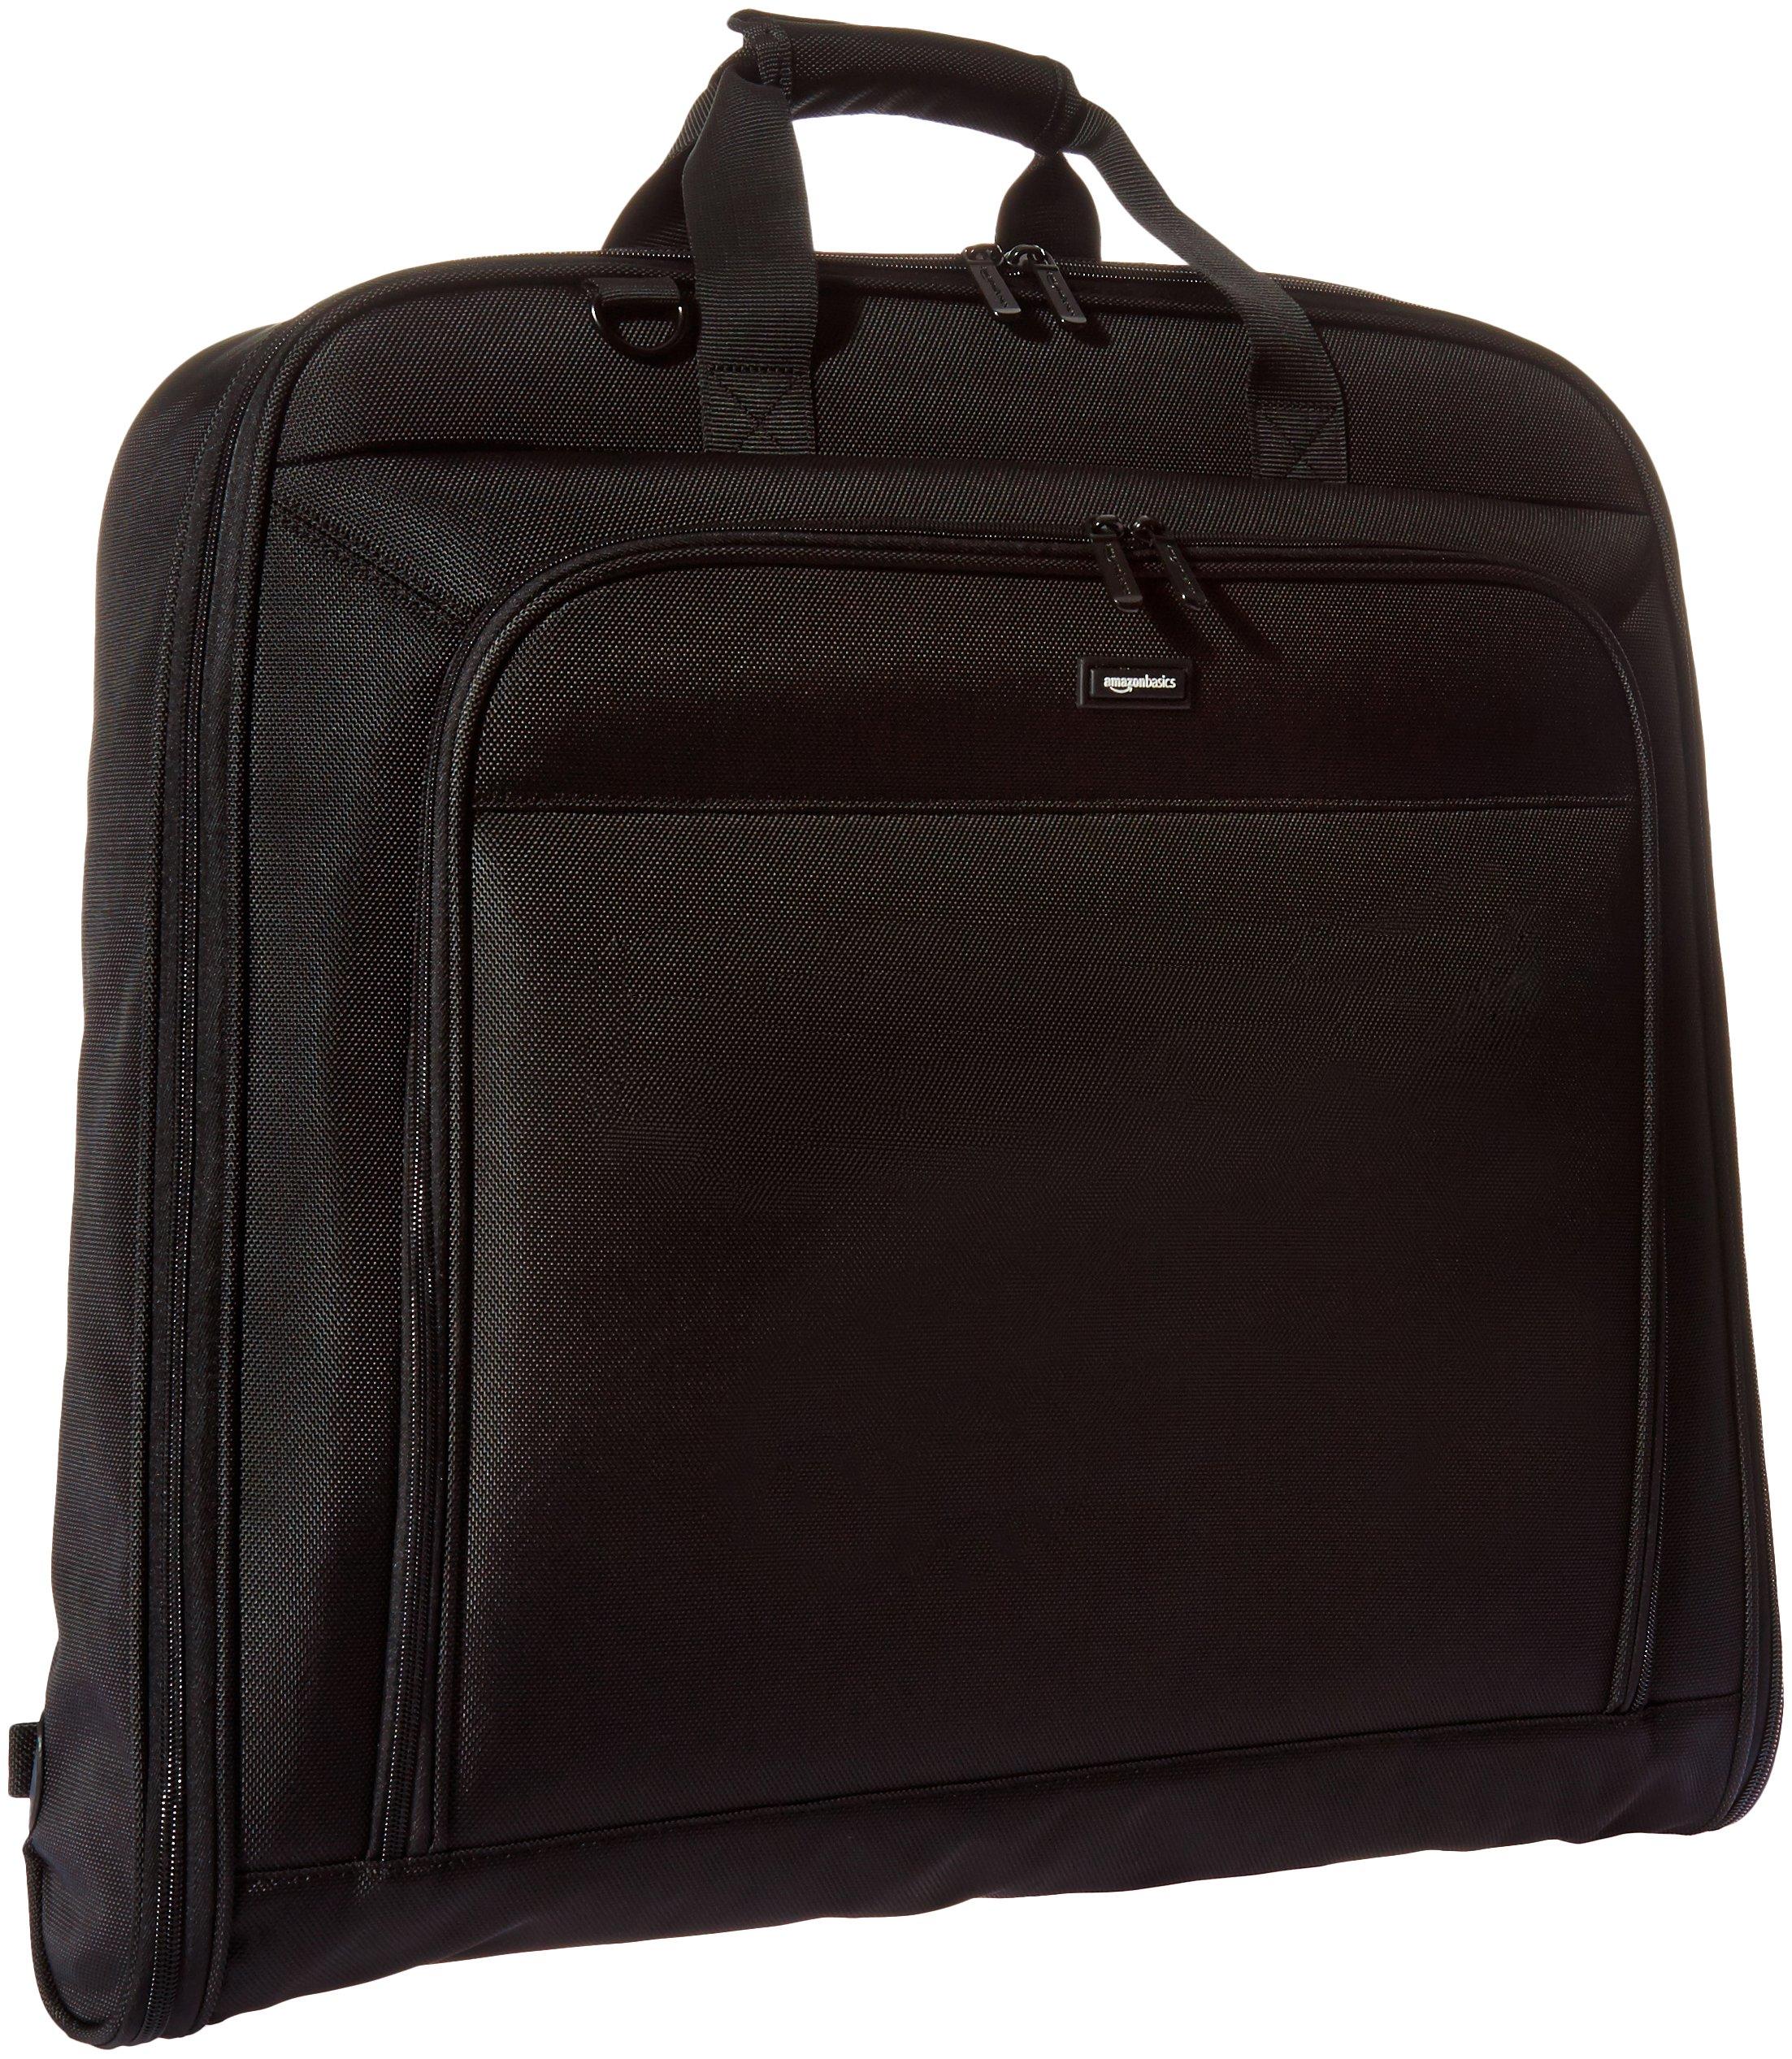 AmazonBasics Premium Hanging Luggage Garment